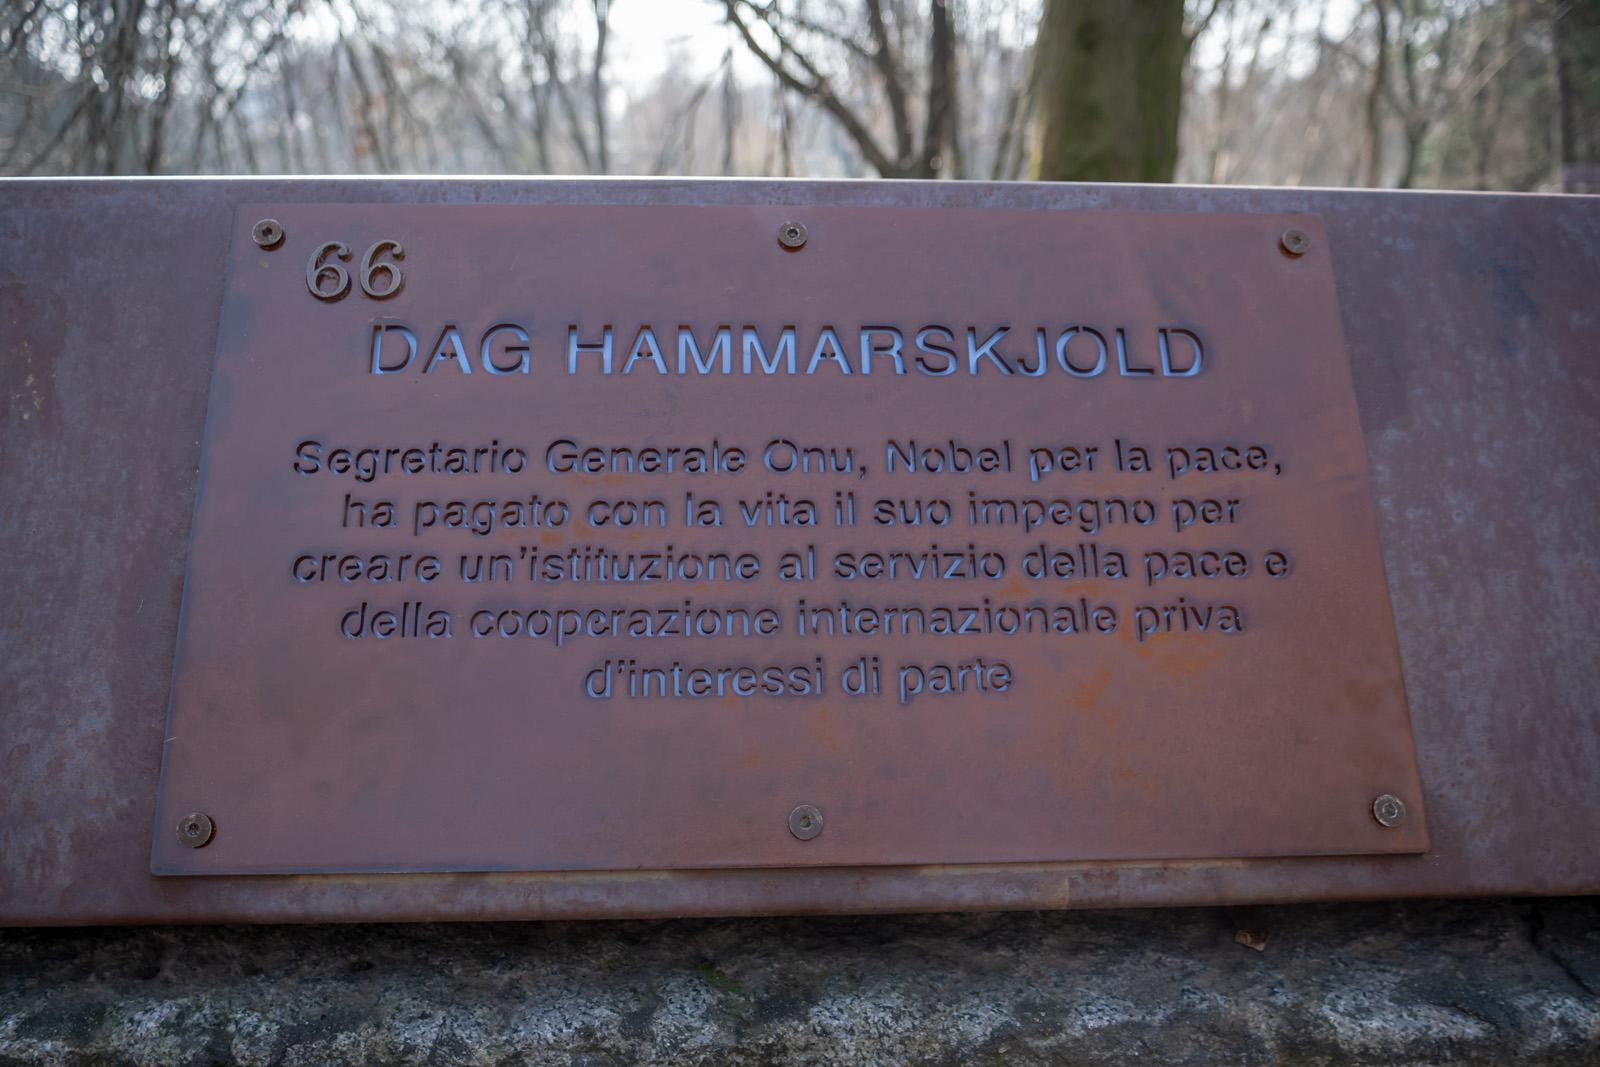 The plaque for Dag Hammarskjold